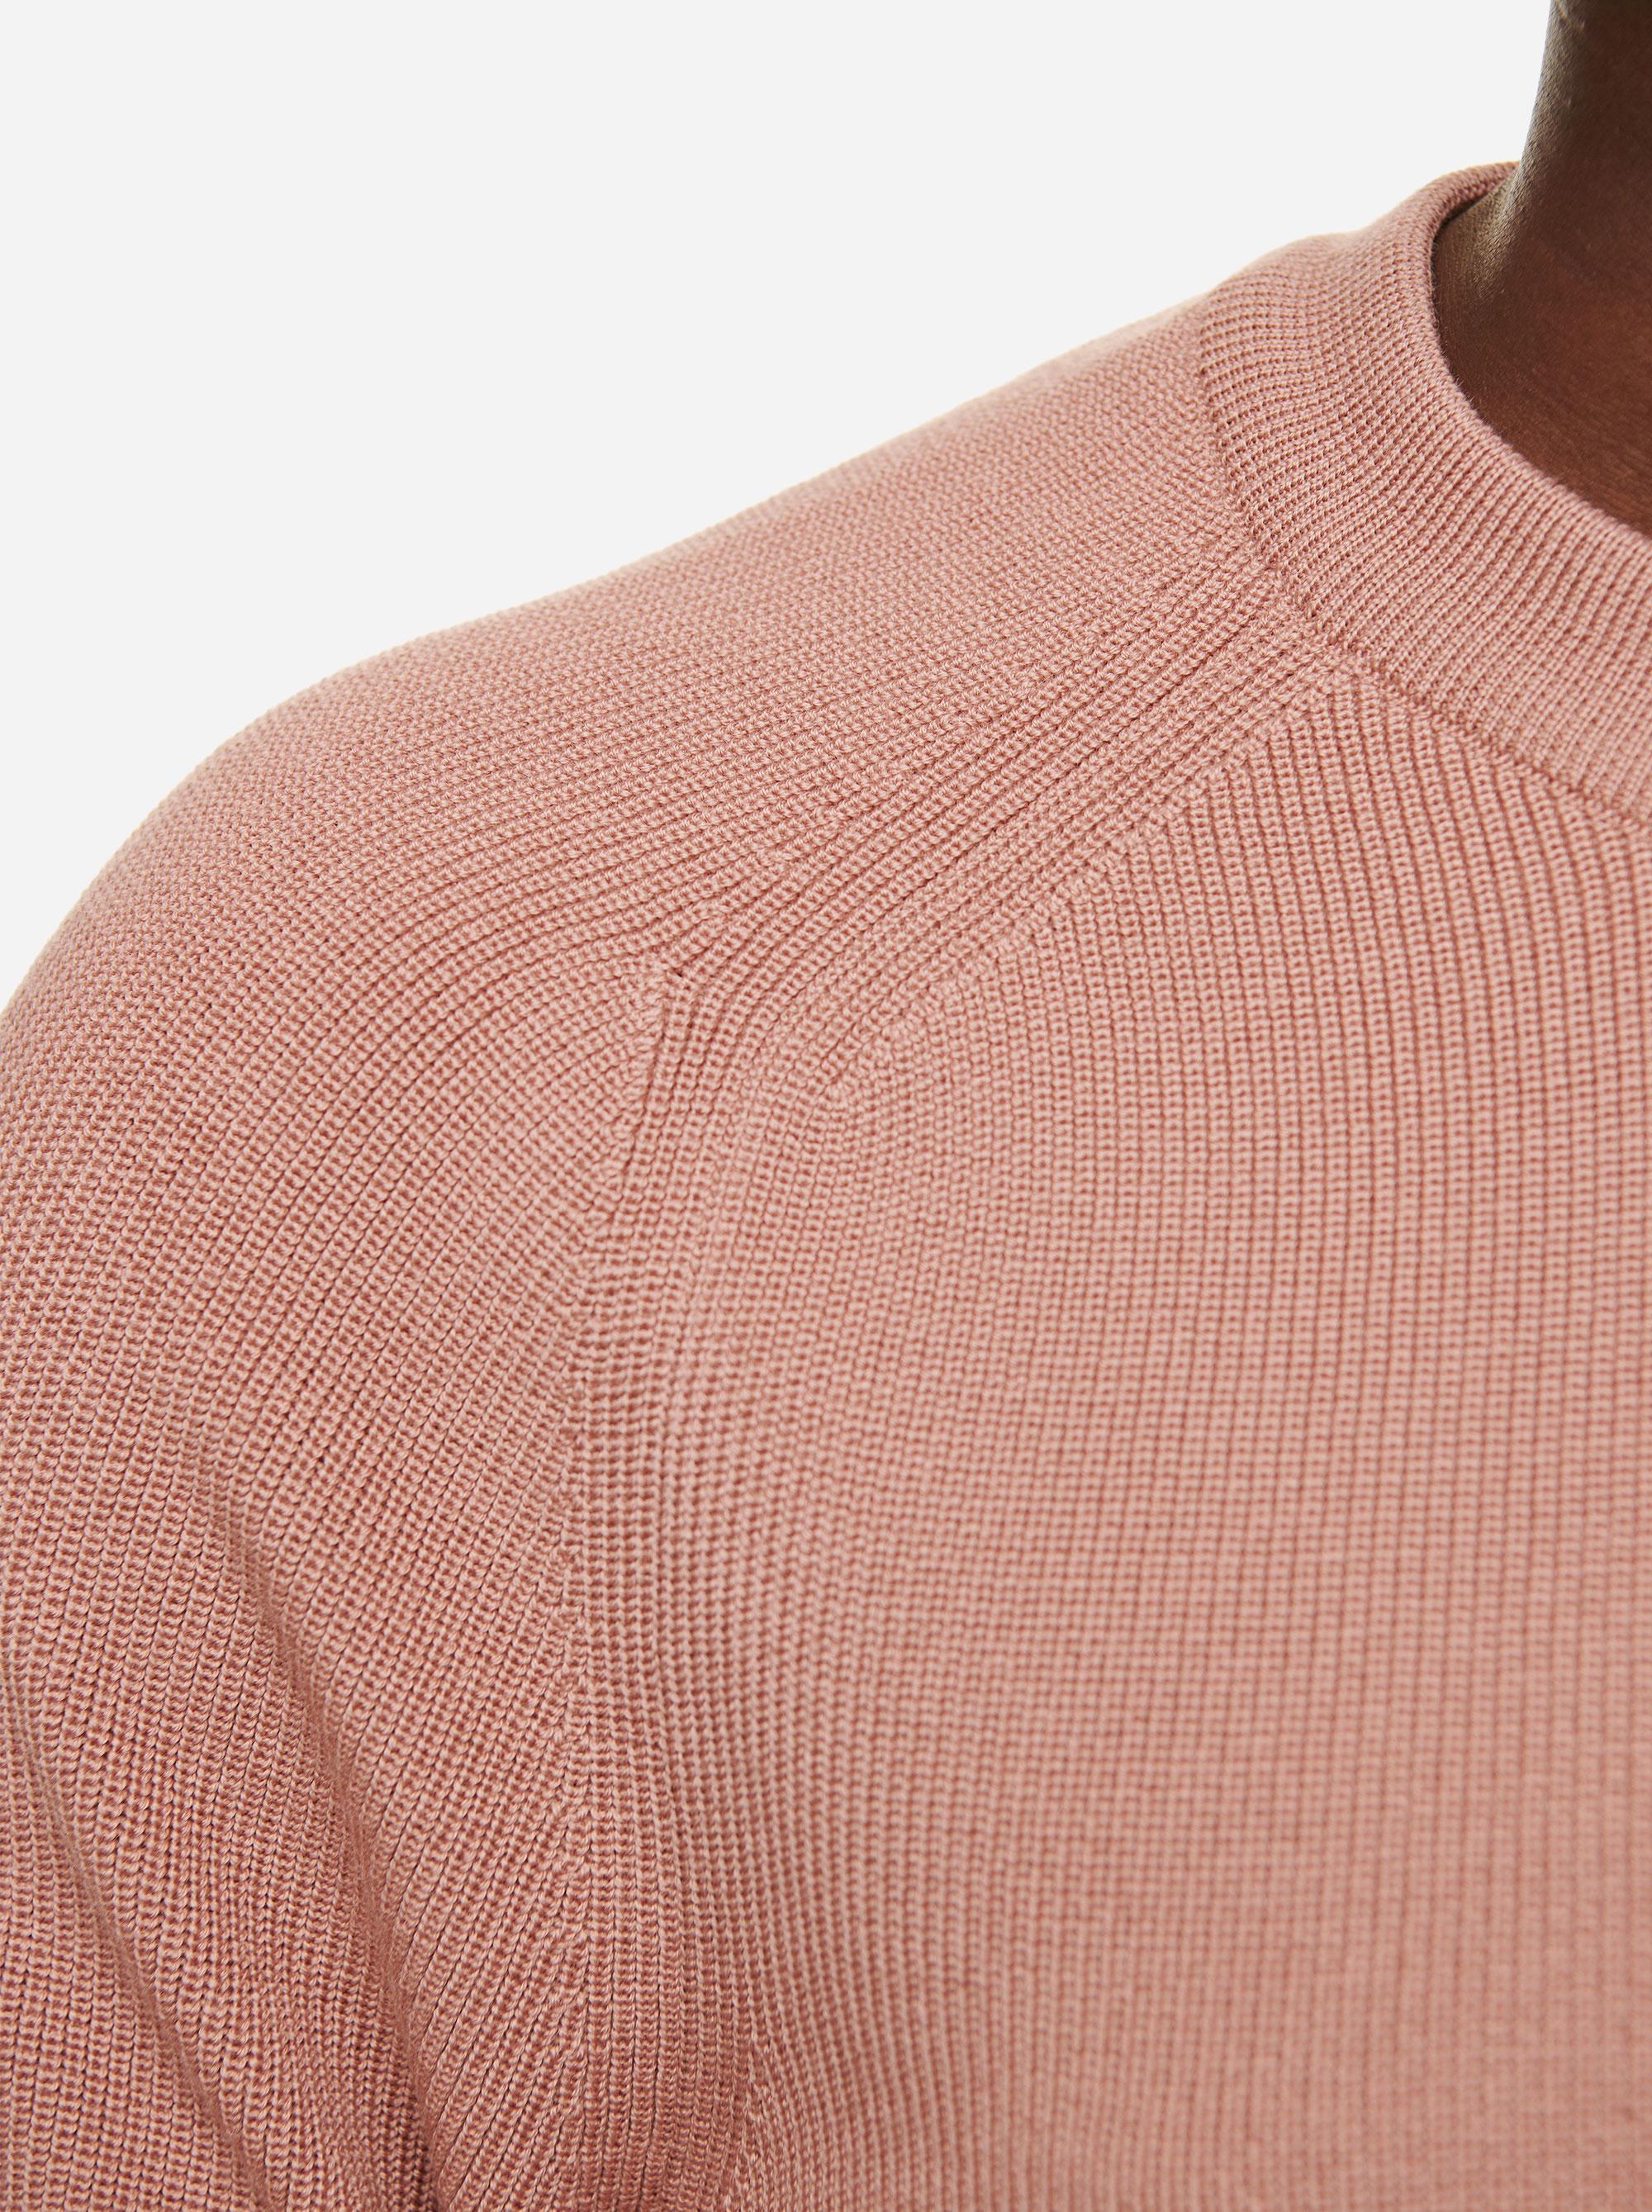 Teym - The Merino Sweater - Men - Pink - 3